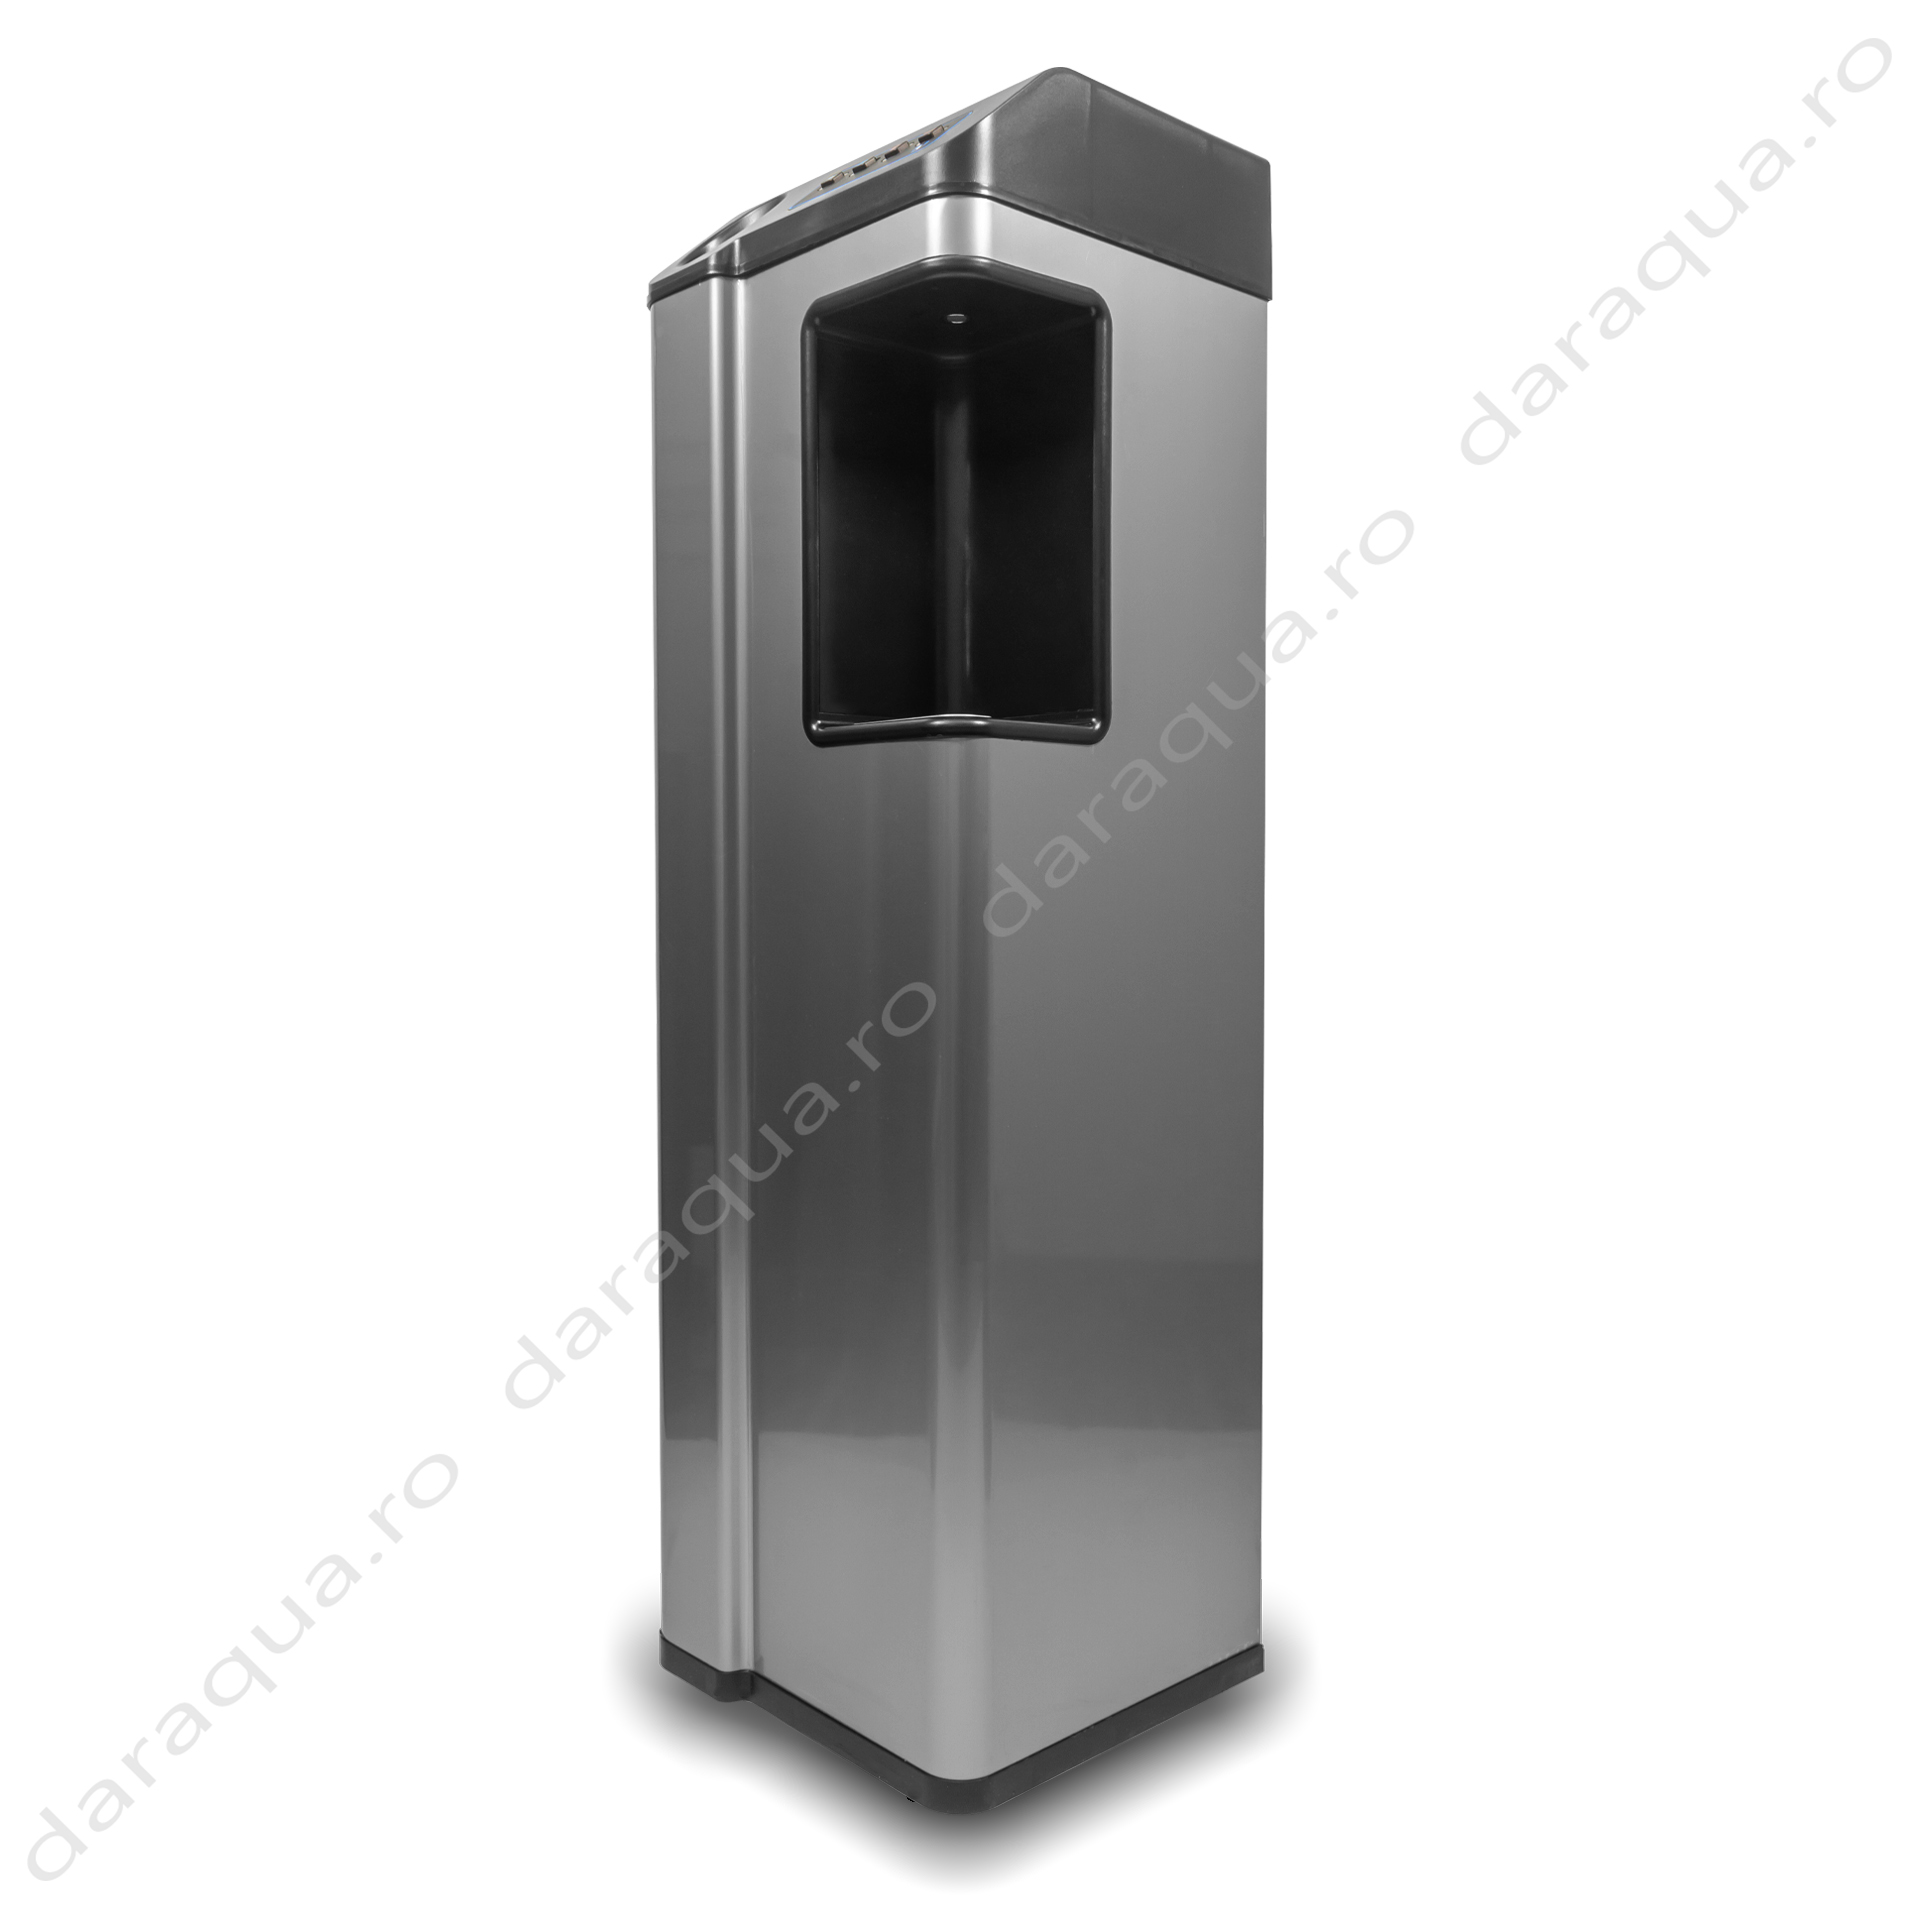 Purificator Aquality cu apa calda, rece si la temperatura camerei